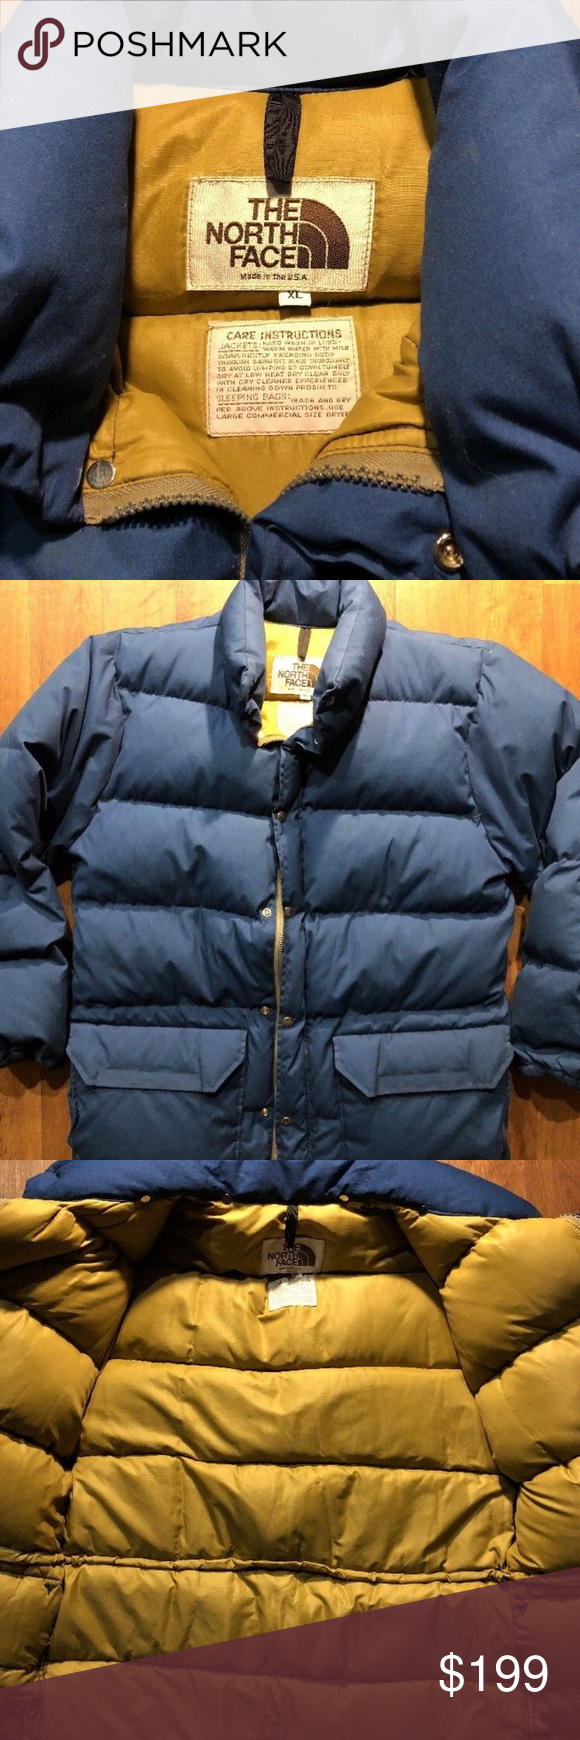 Vintage The North Face 70 Parka Coat Jacket Xl Vintage The North Face 70 Parka Coat Jacket Men S Size Xl Puffy Double Zip Ma Parka Coat Jackets Coats Jackets [ 1740 x 580 Pixel ]